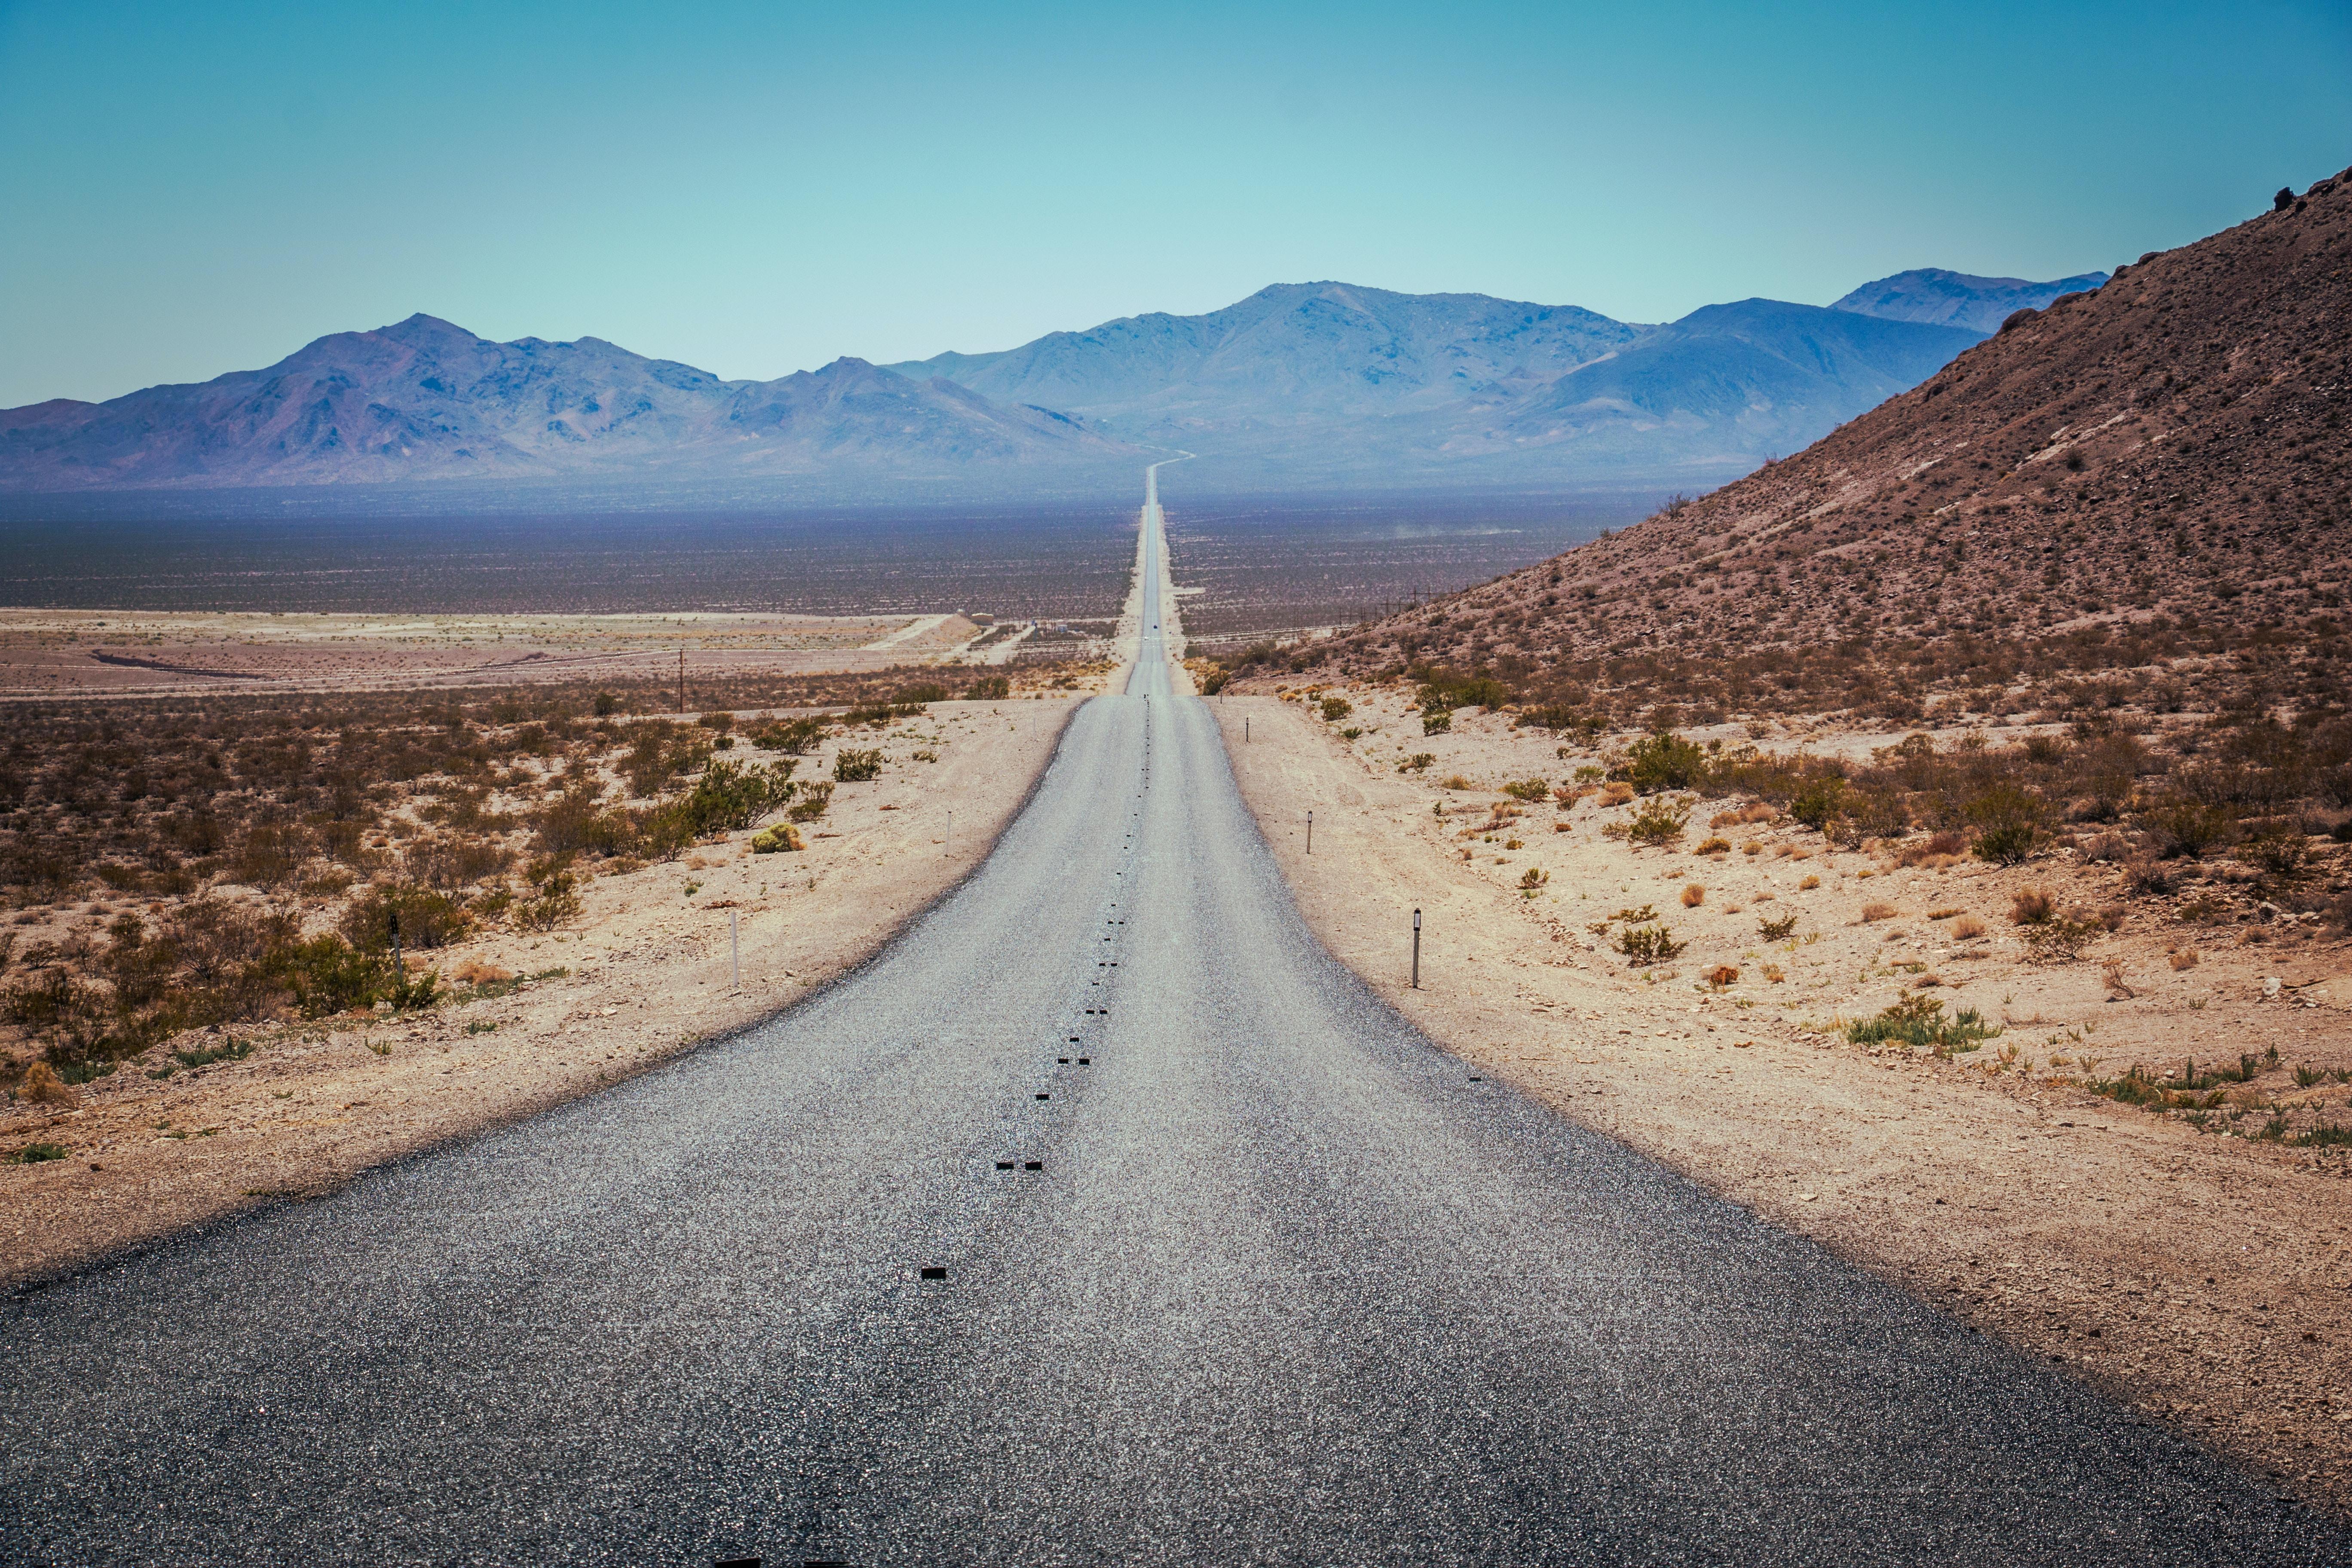 grey asphalt road heading mountain